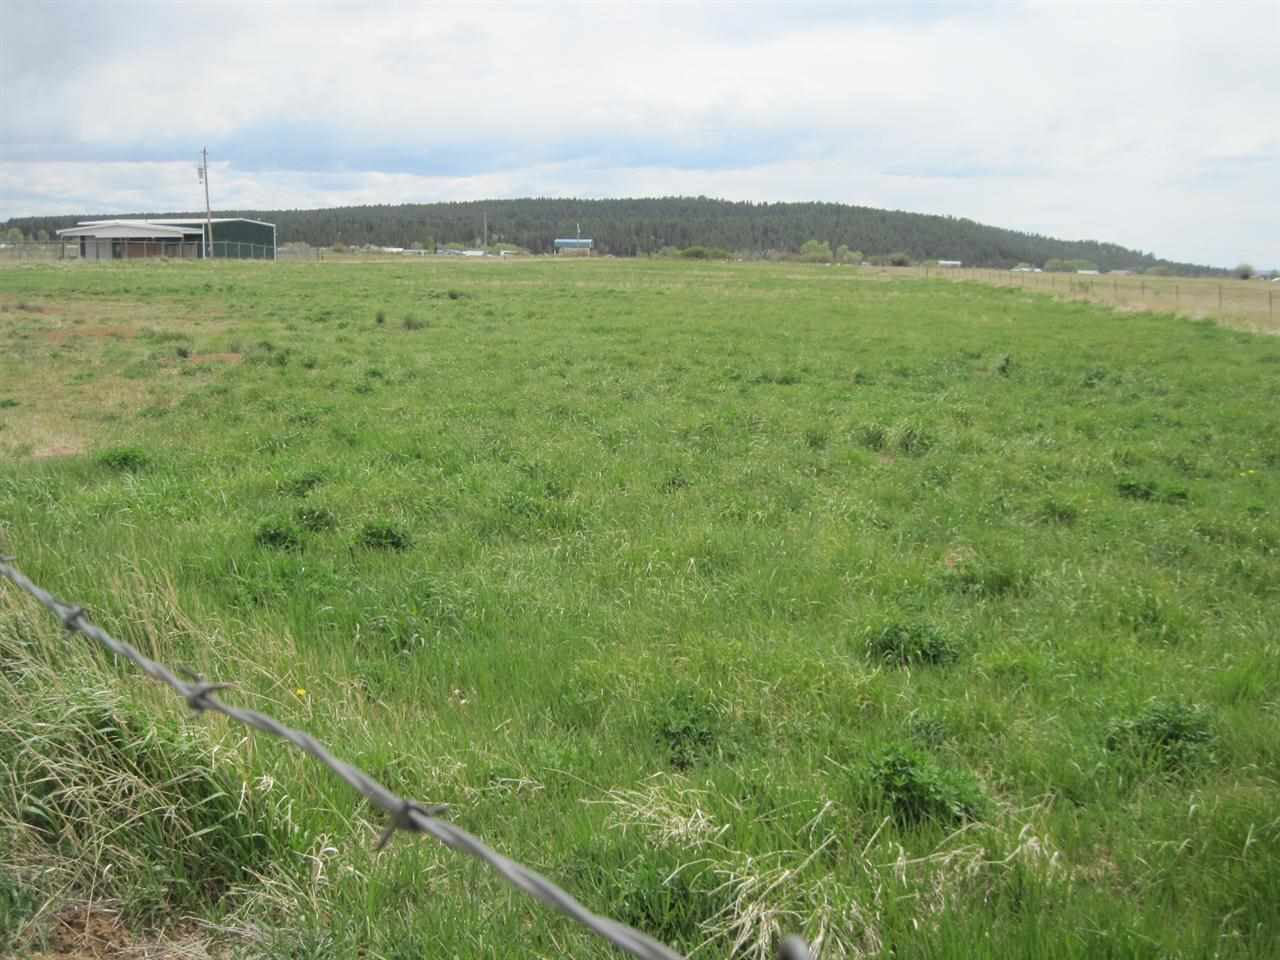 Highway 84 Private Drive, Tierra Amarilla NM 87575 - Photo 1